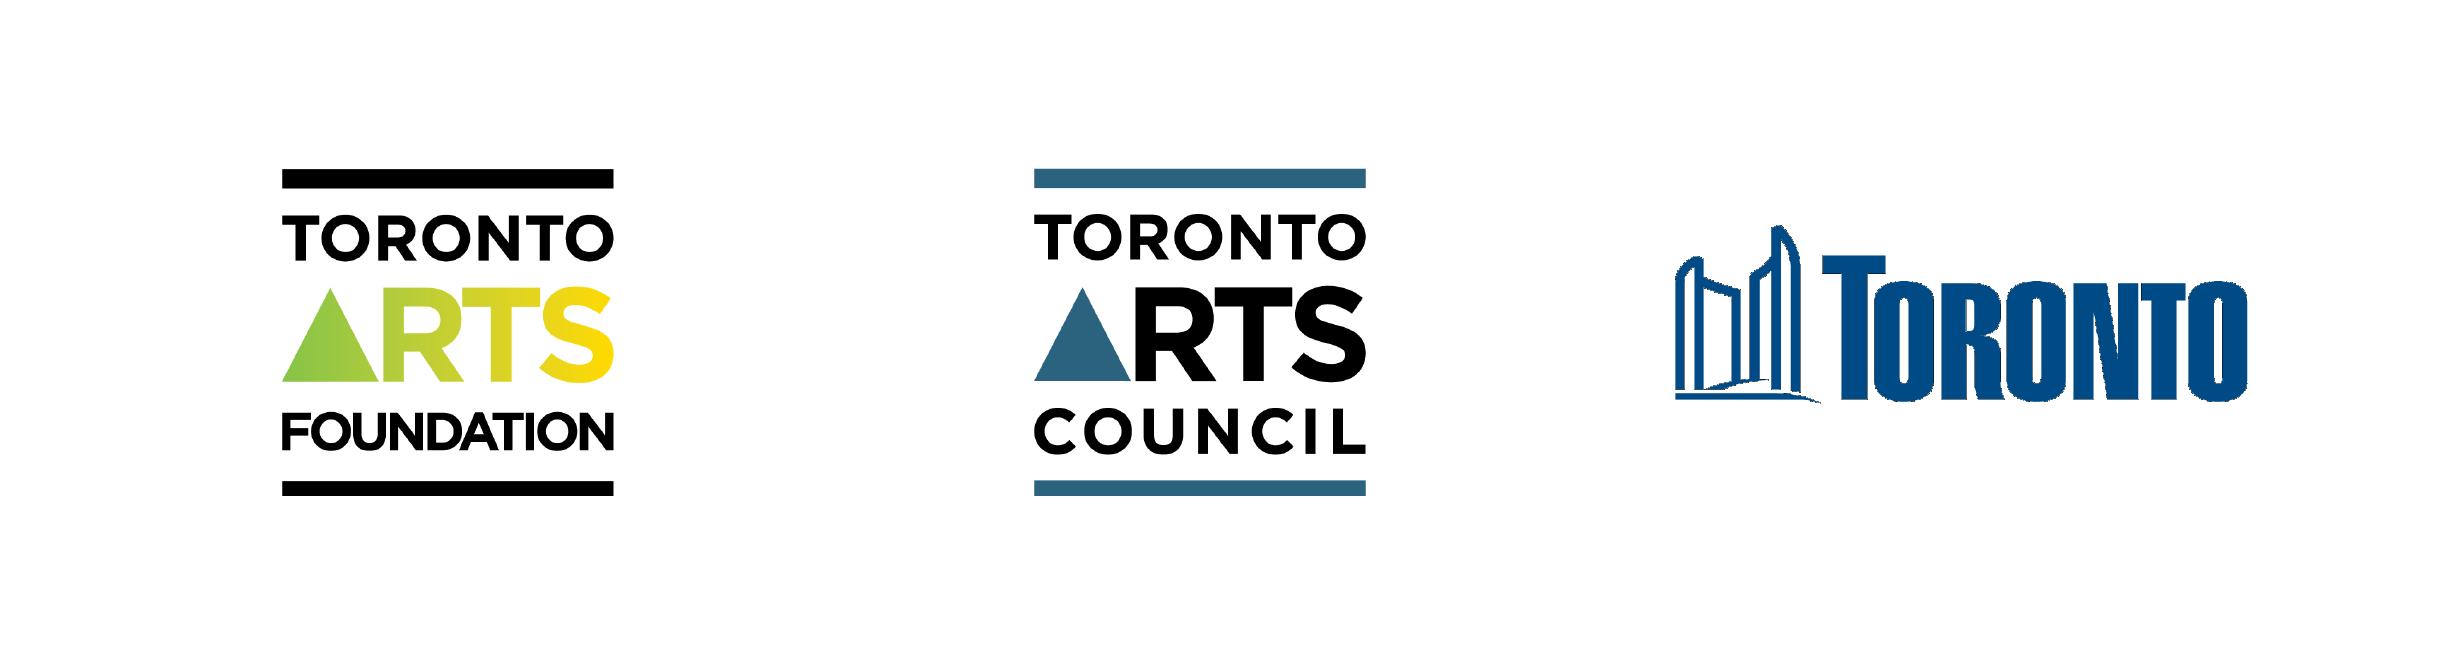 Logos of Toronto Arts Foundation, Toronto Arts Council and the City of Toronto